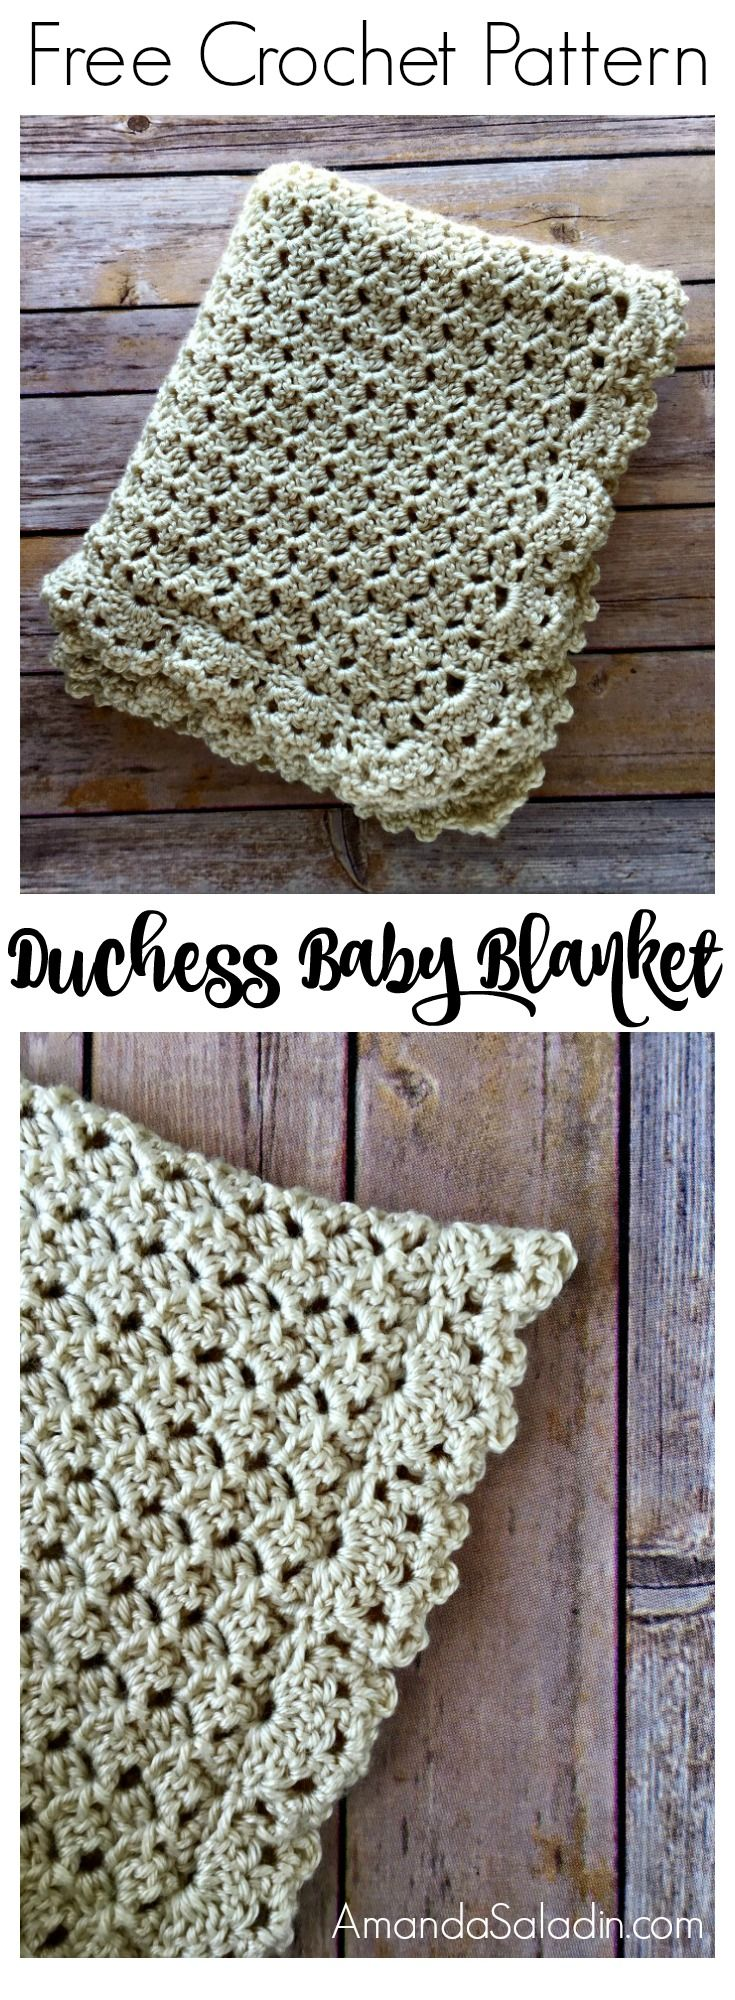 Free Crochet Pattern - Duchess Baby Blanket